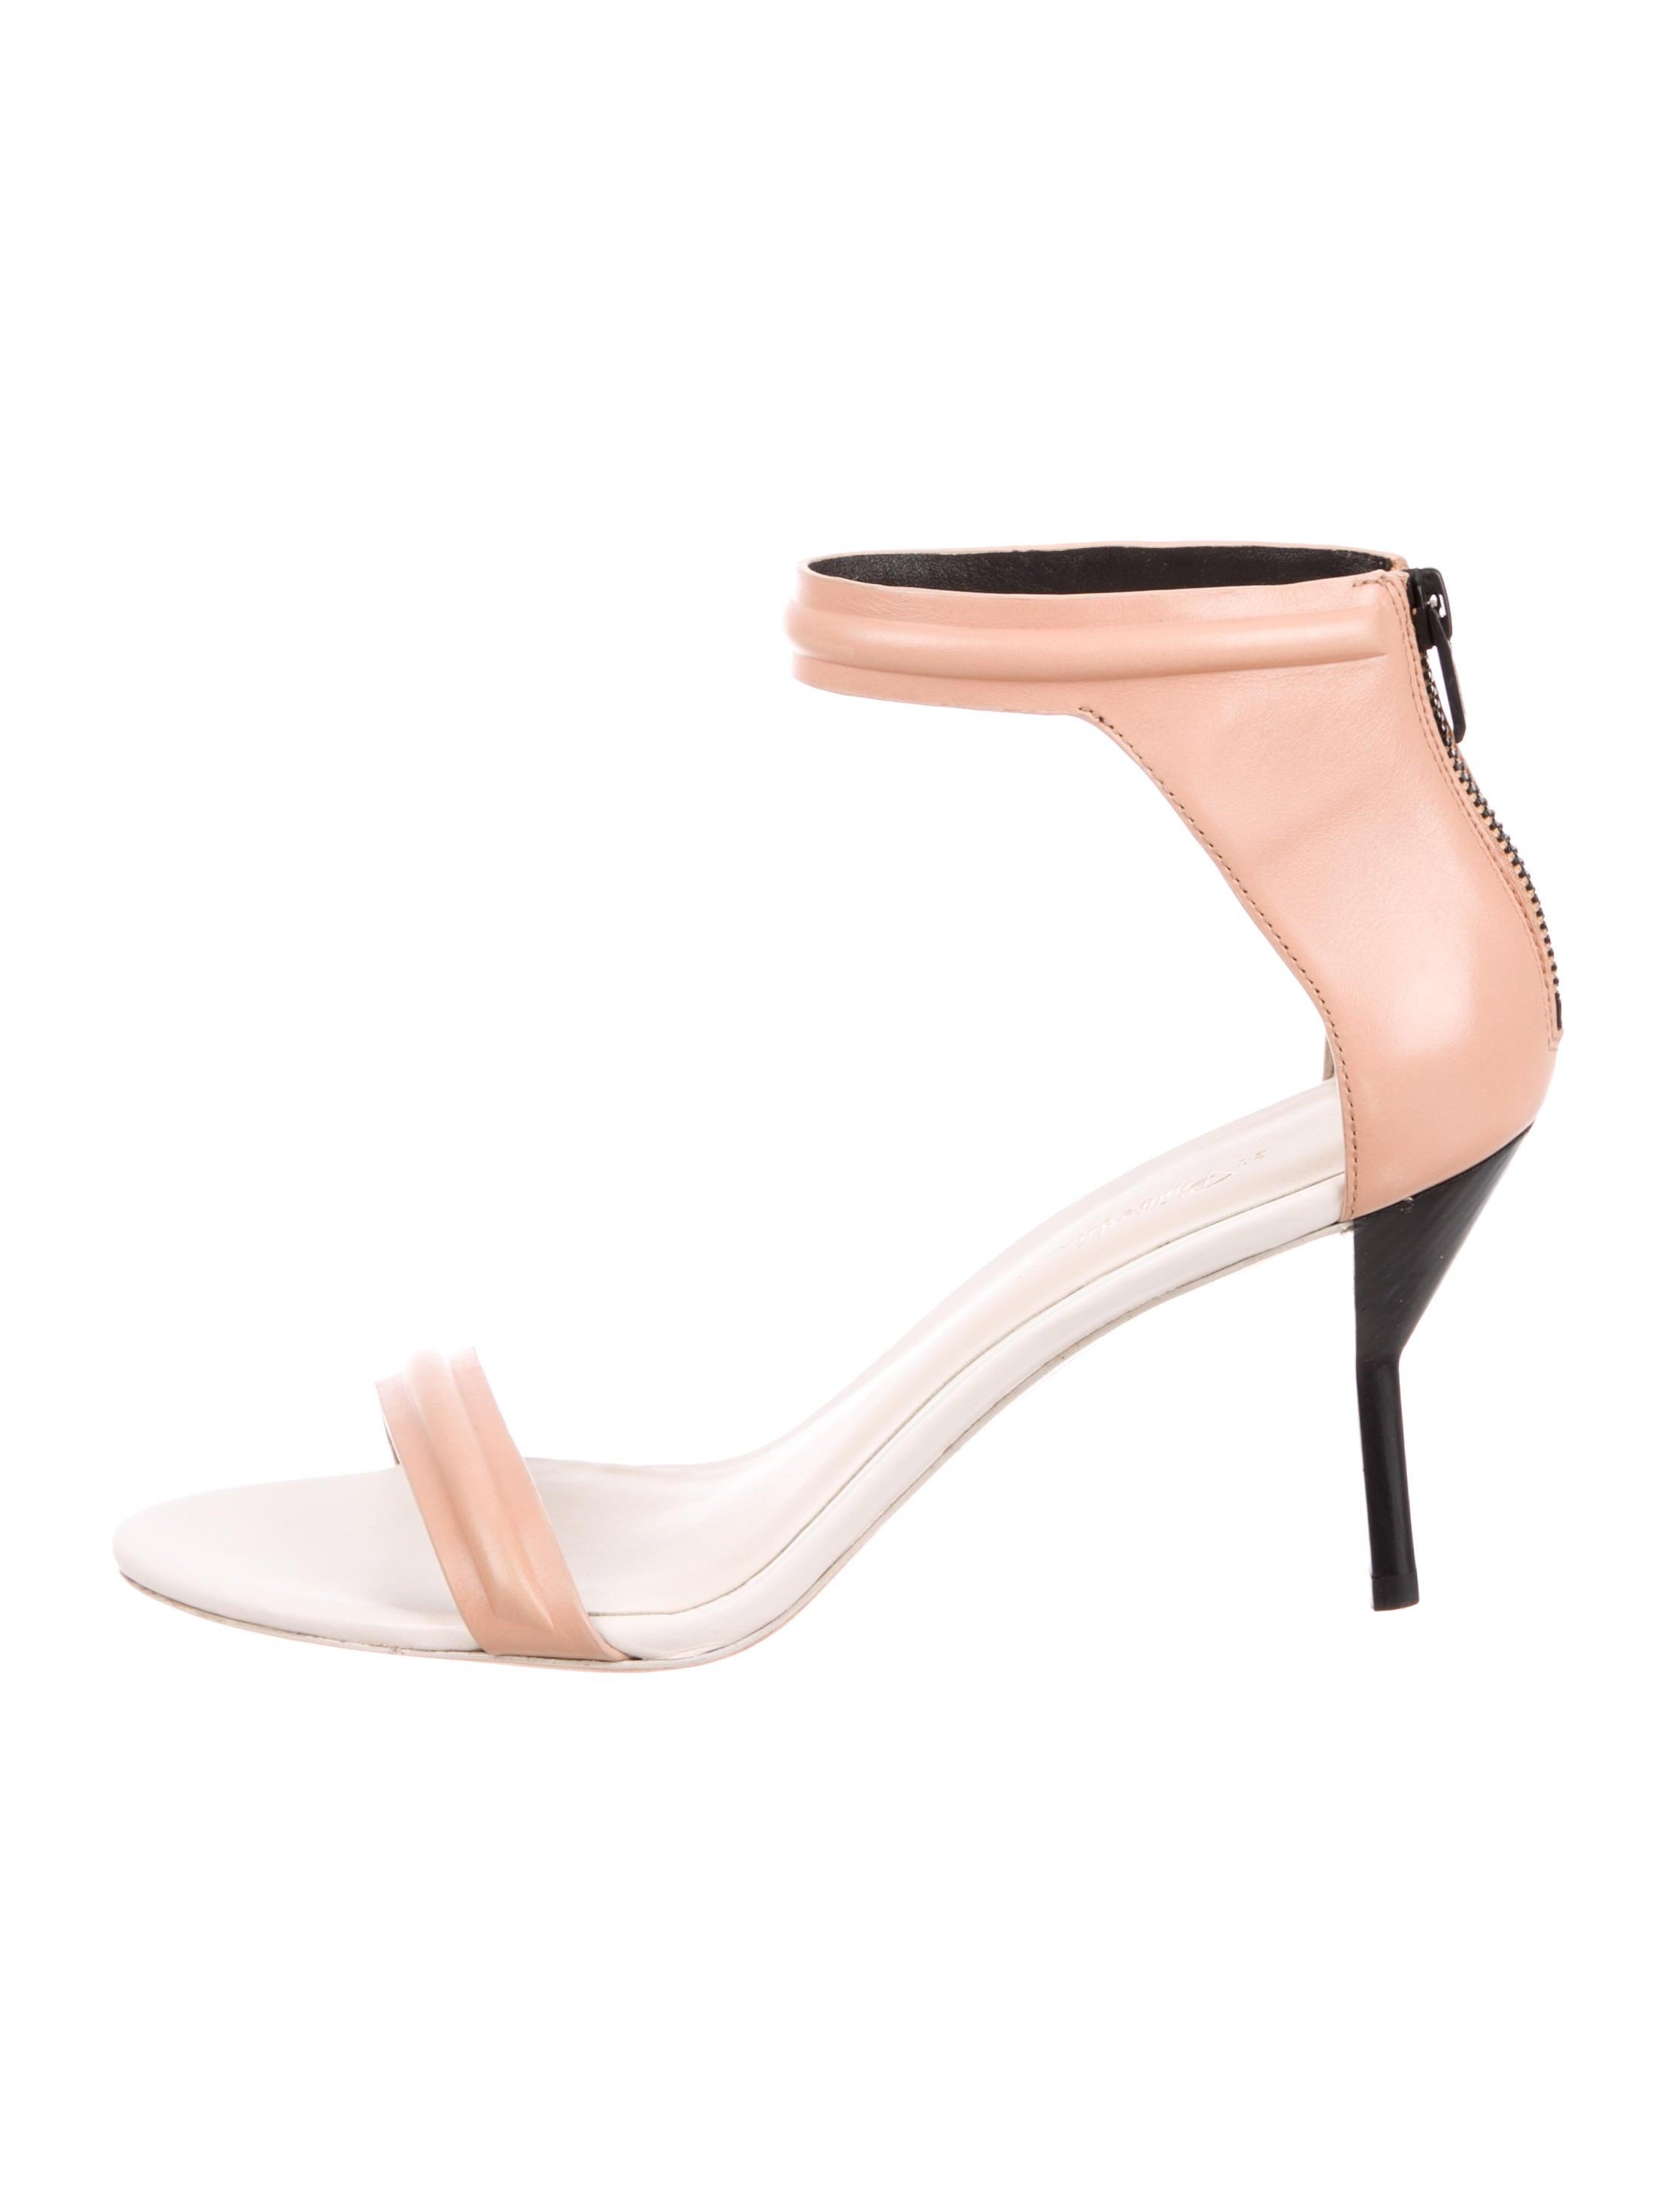 cheap sale 3.1 Phillip Lim Martini Ankle Strap Sandals w/ Tags outlet 6wSqik5VC